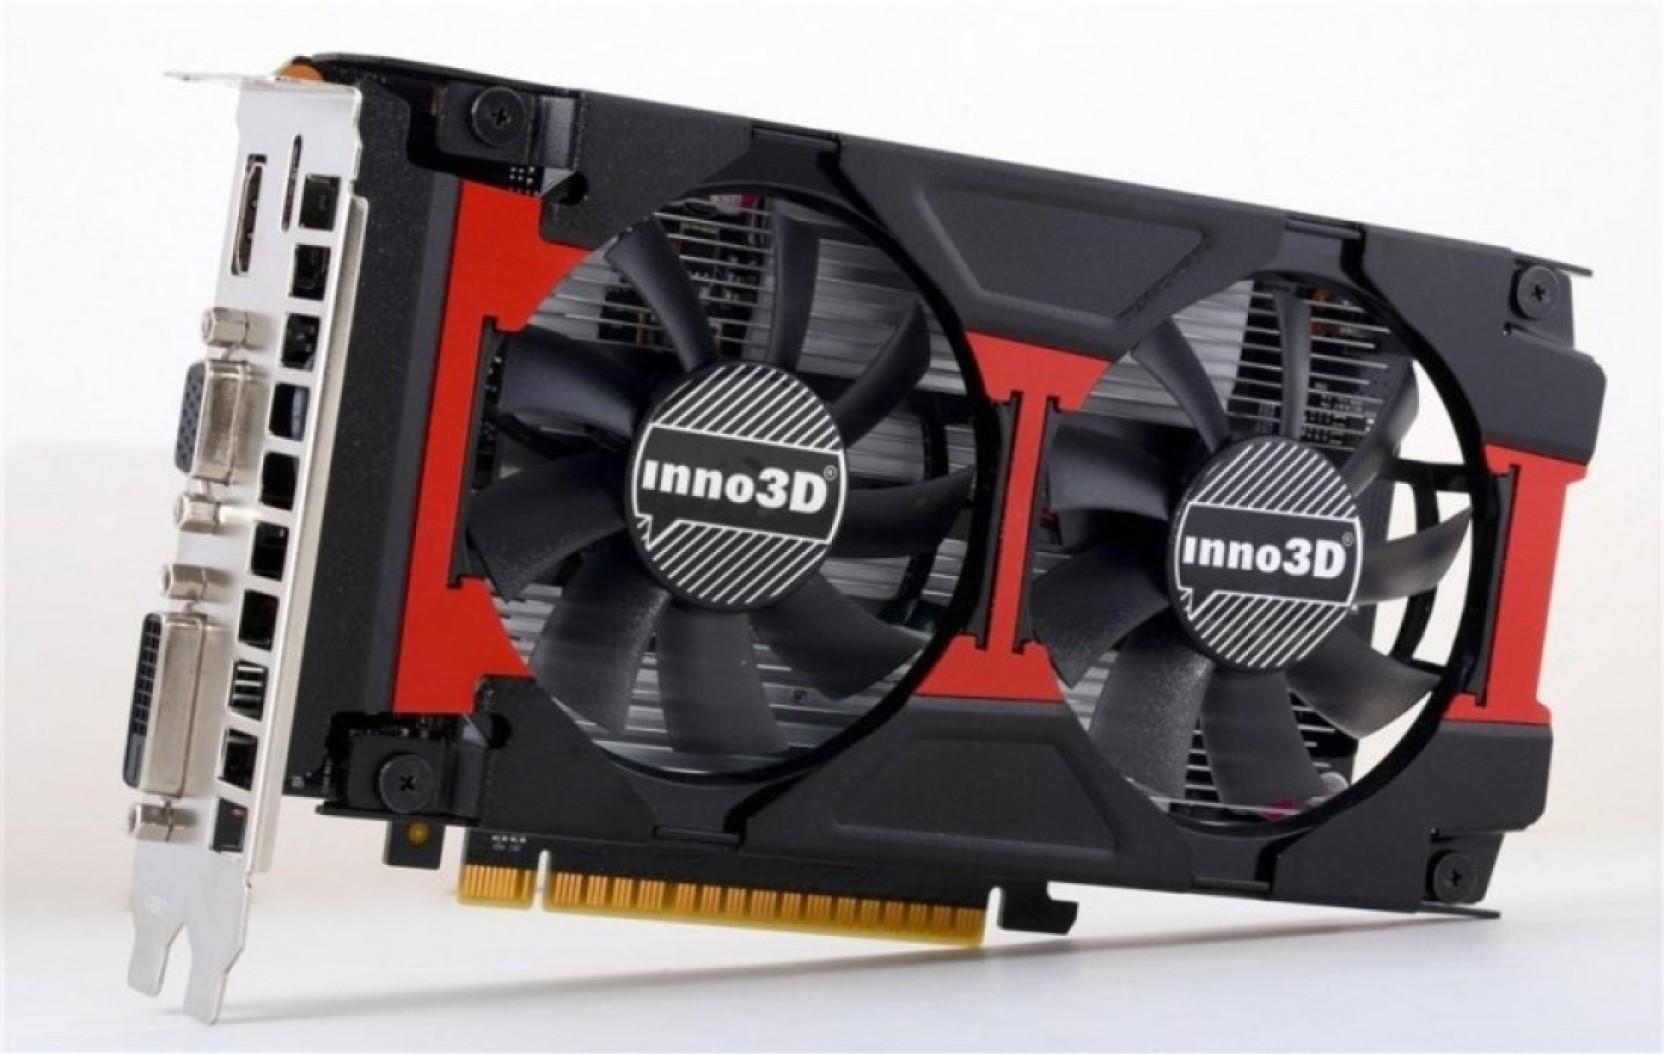 Inno3d Nvidia Geforce Gtx 750 Ti 2 Gb Gddr5 Graphics Card Inno 3d 1050ti 4gb Ddr5 Compact Share